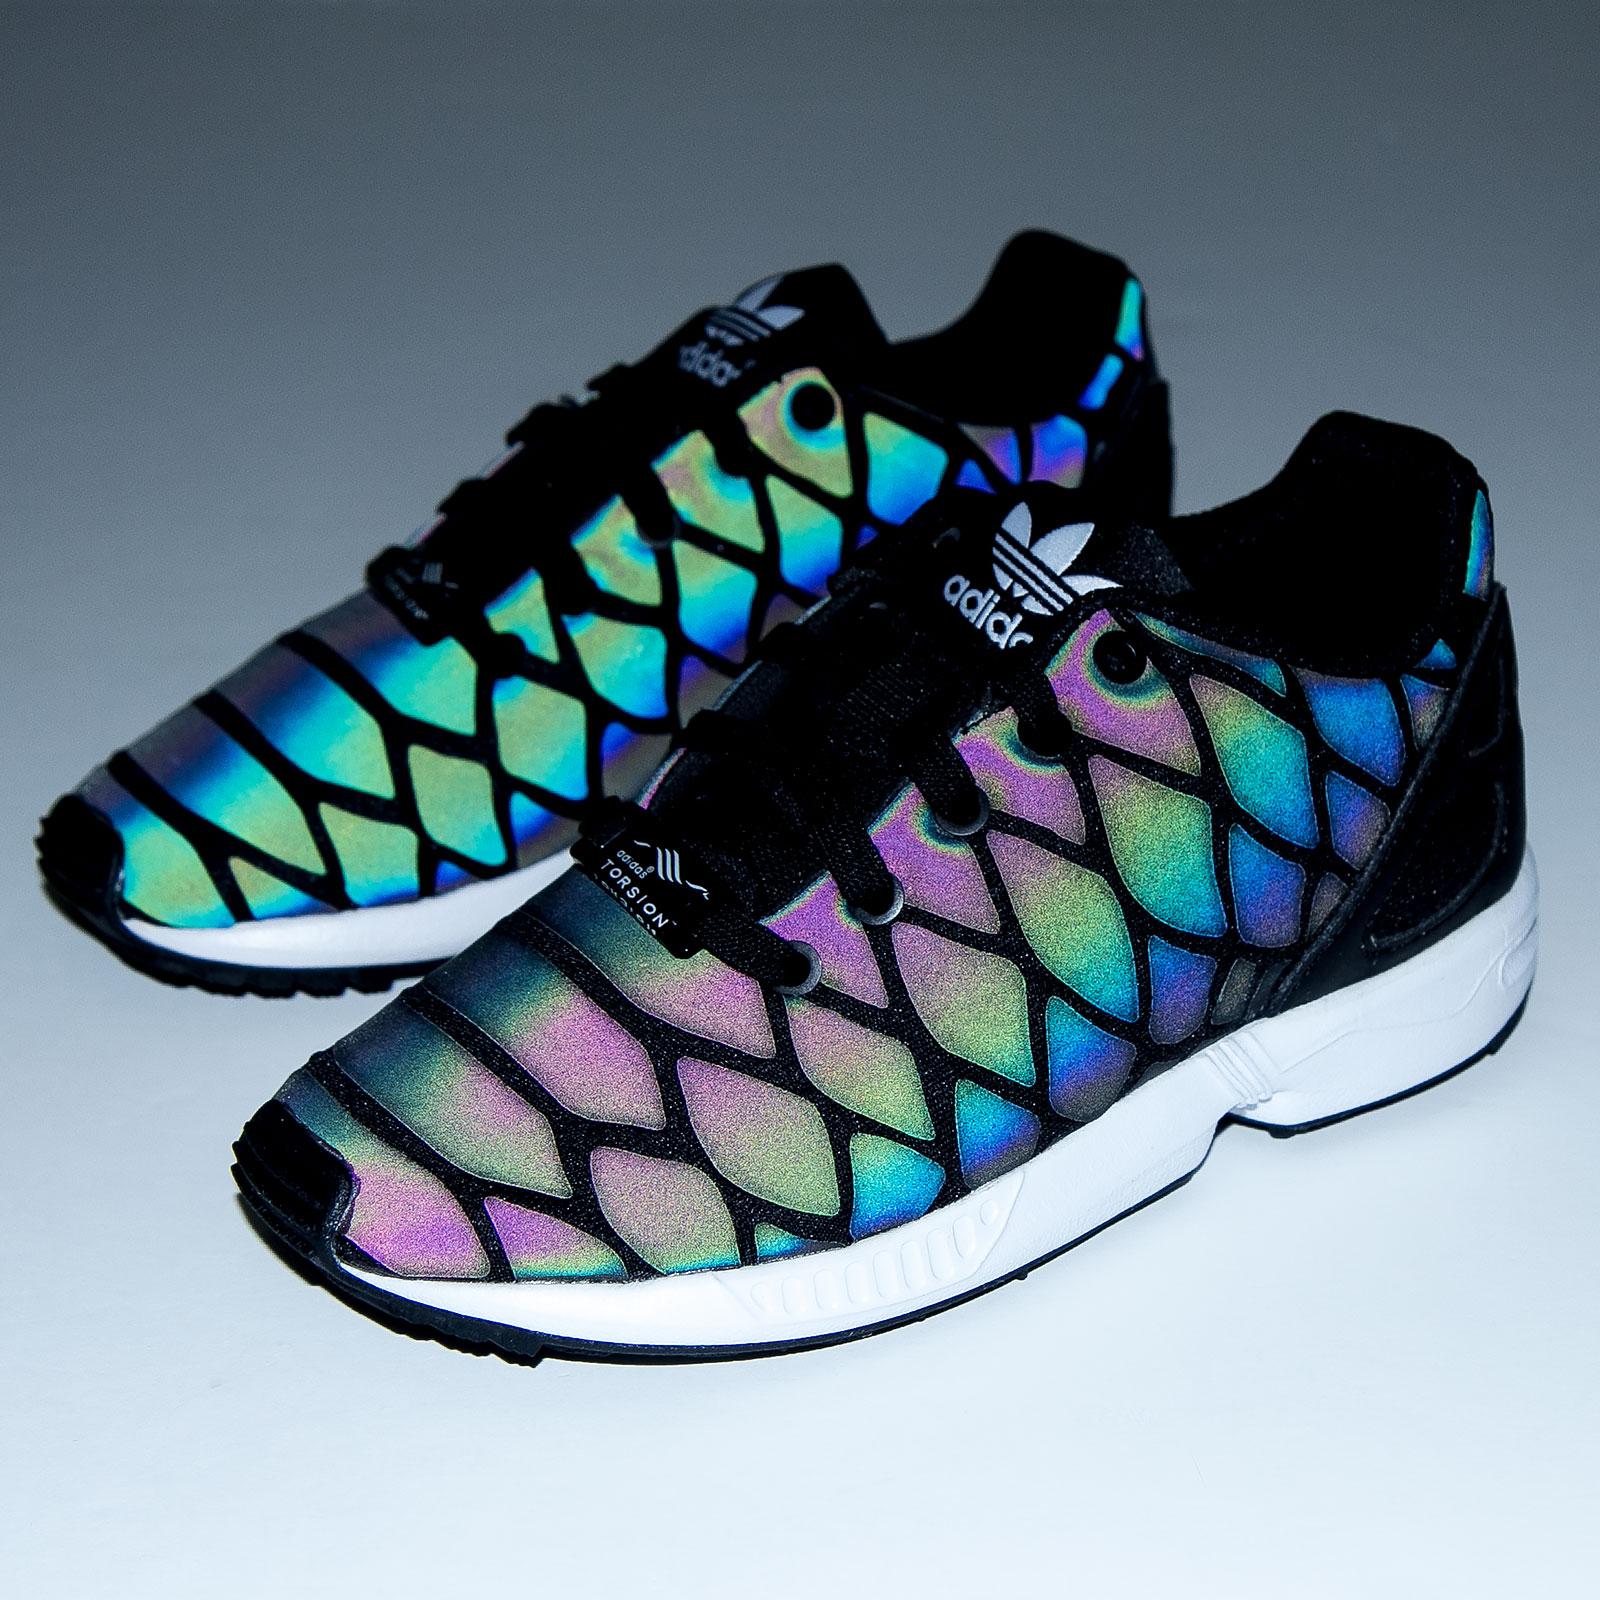 ec16f328e adidas ZX Flux Xenopeltis - S78649 - Sneakersnstuff